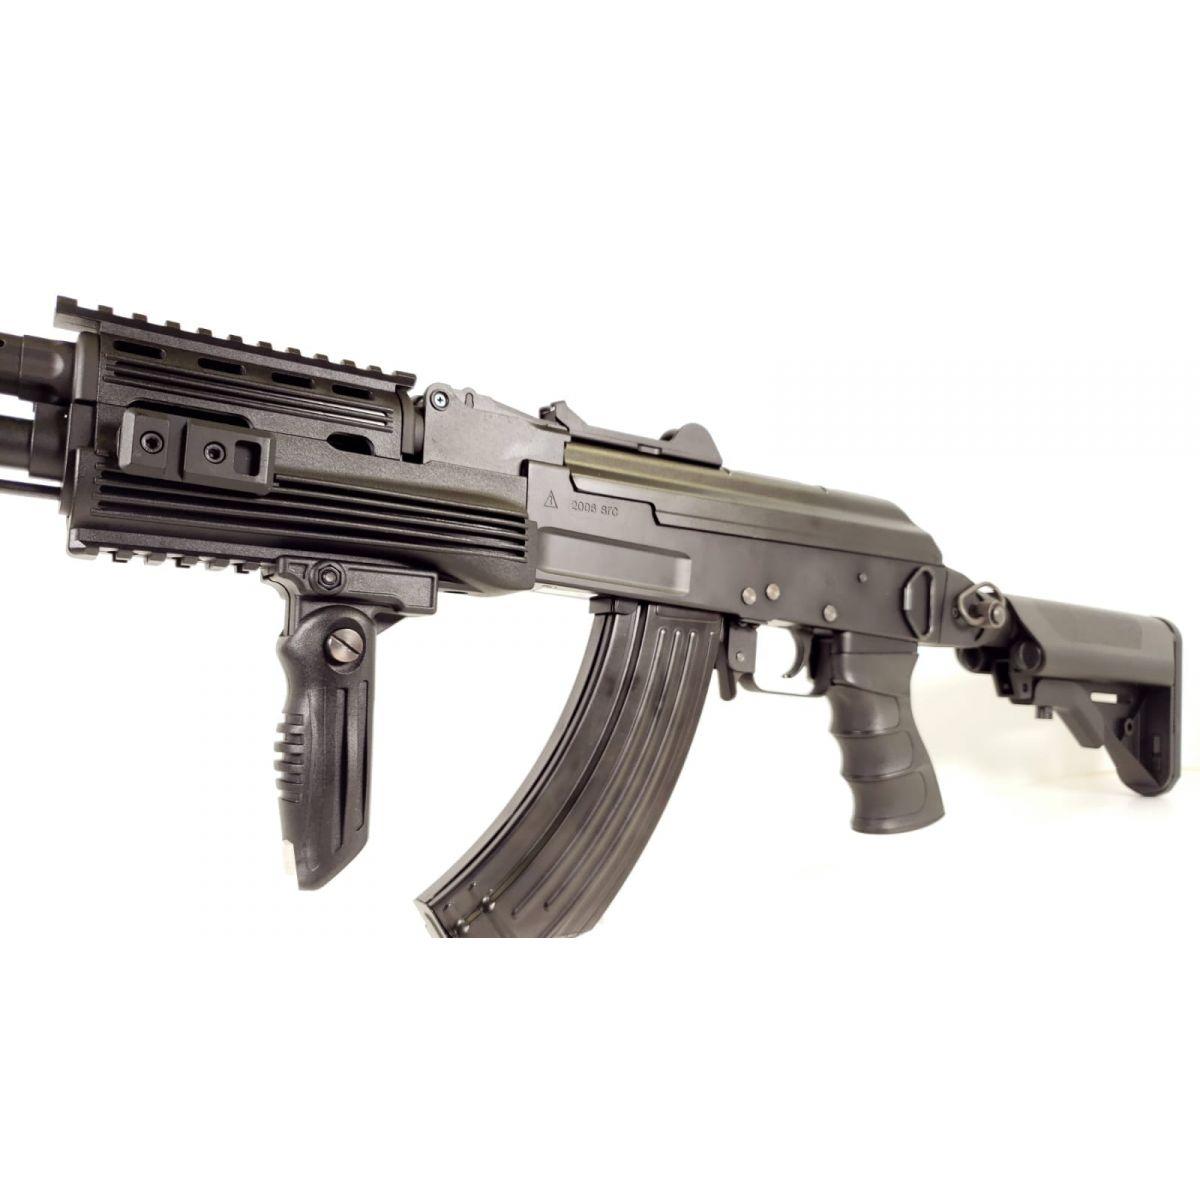 FULL METAL AK47 AEG Electric Airsoft Rifle